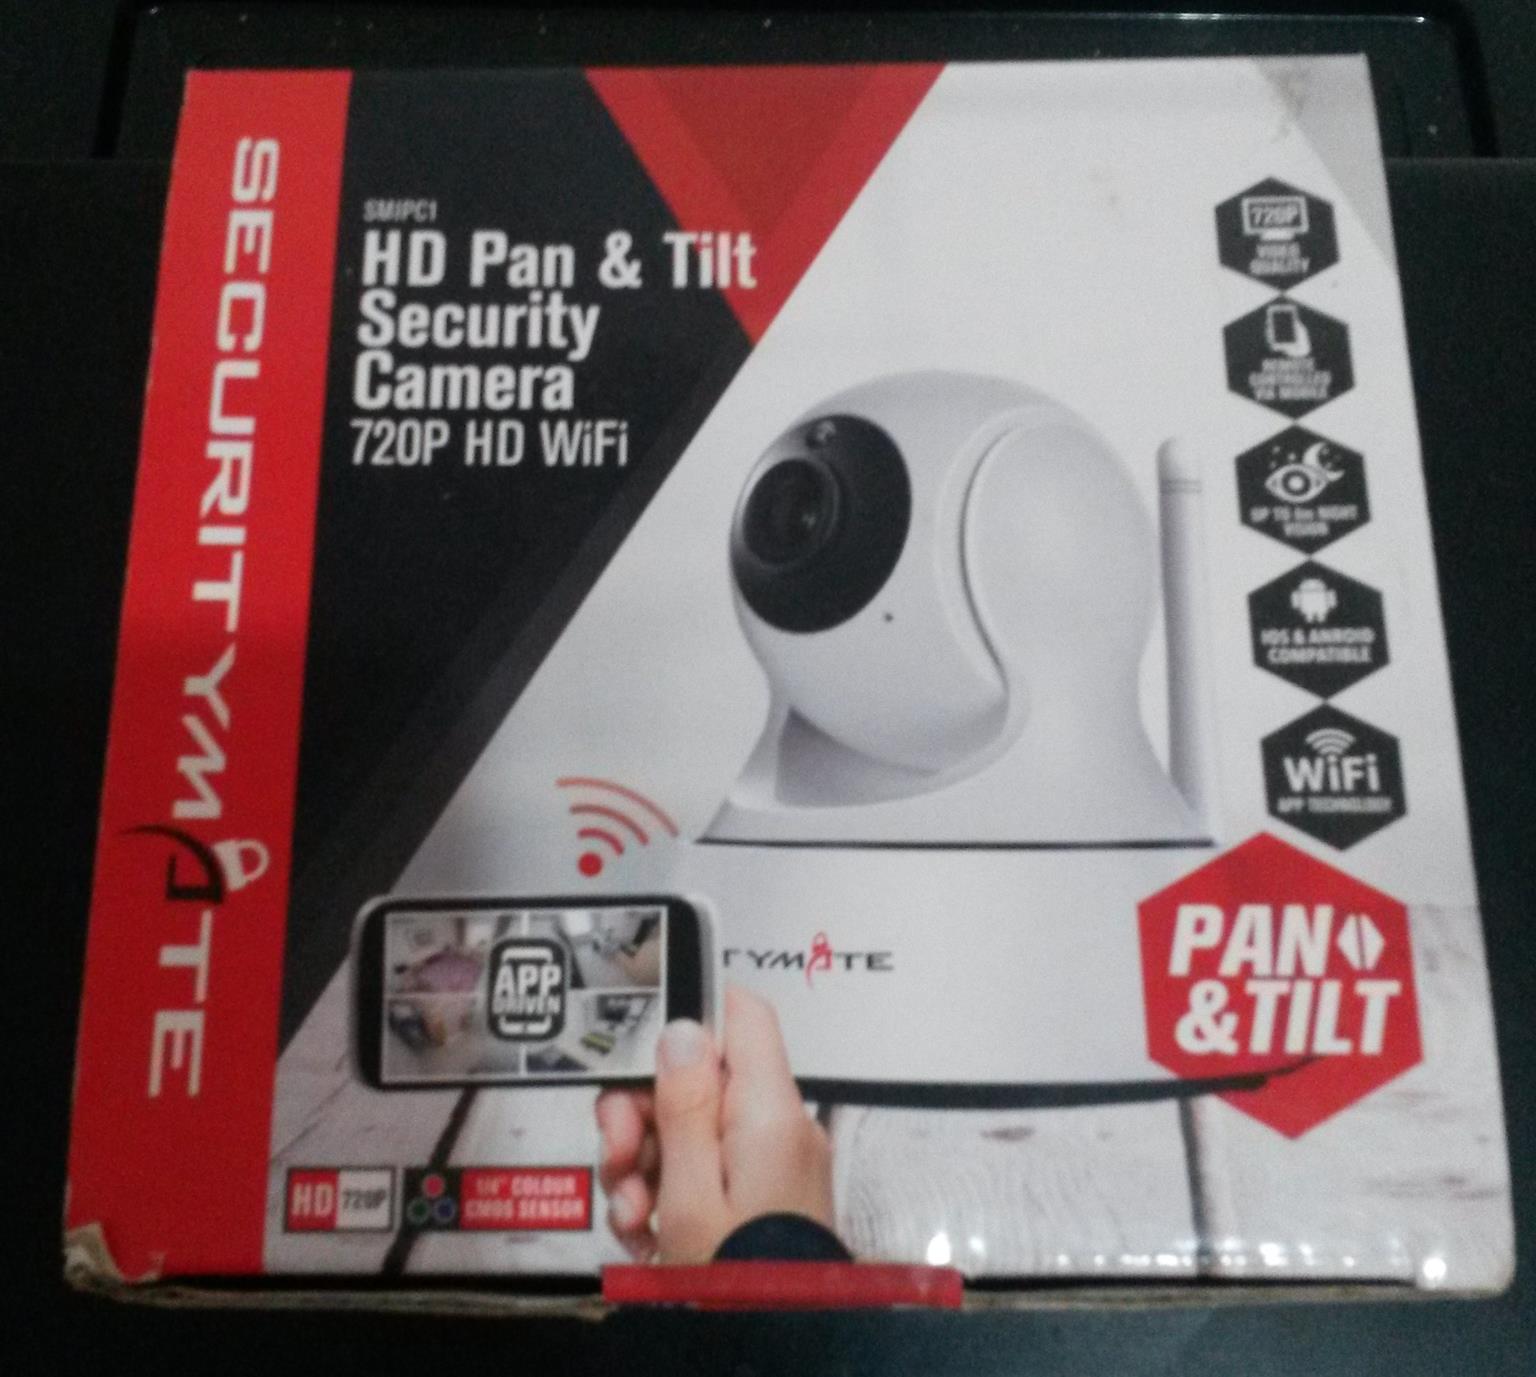 NEW security camera